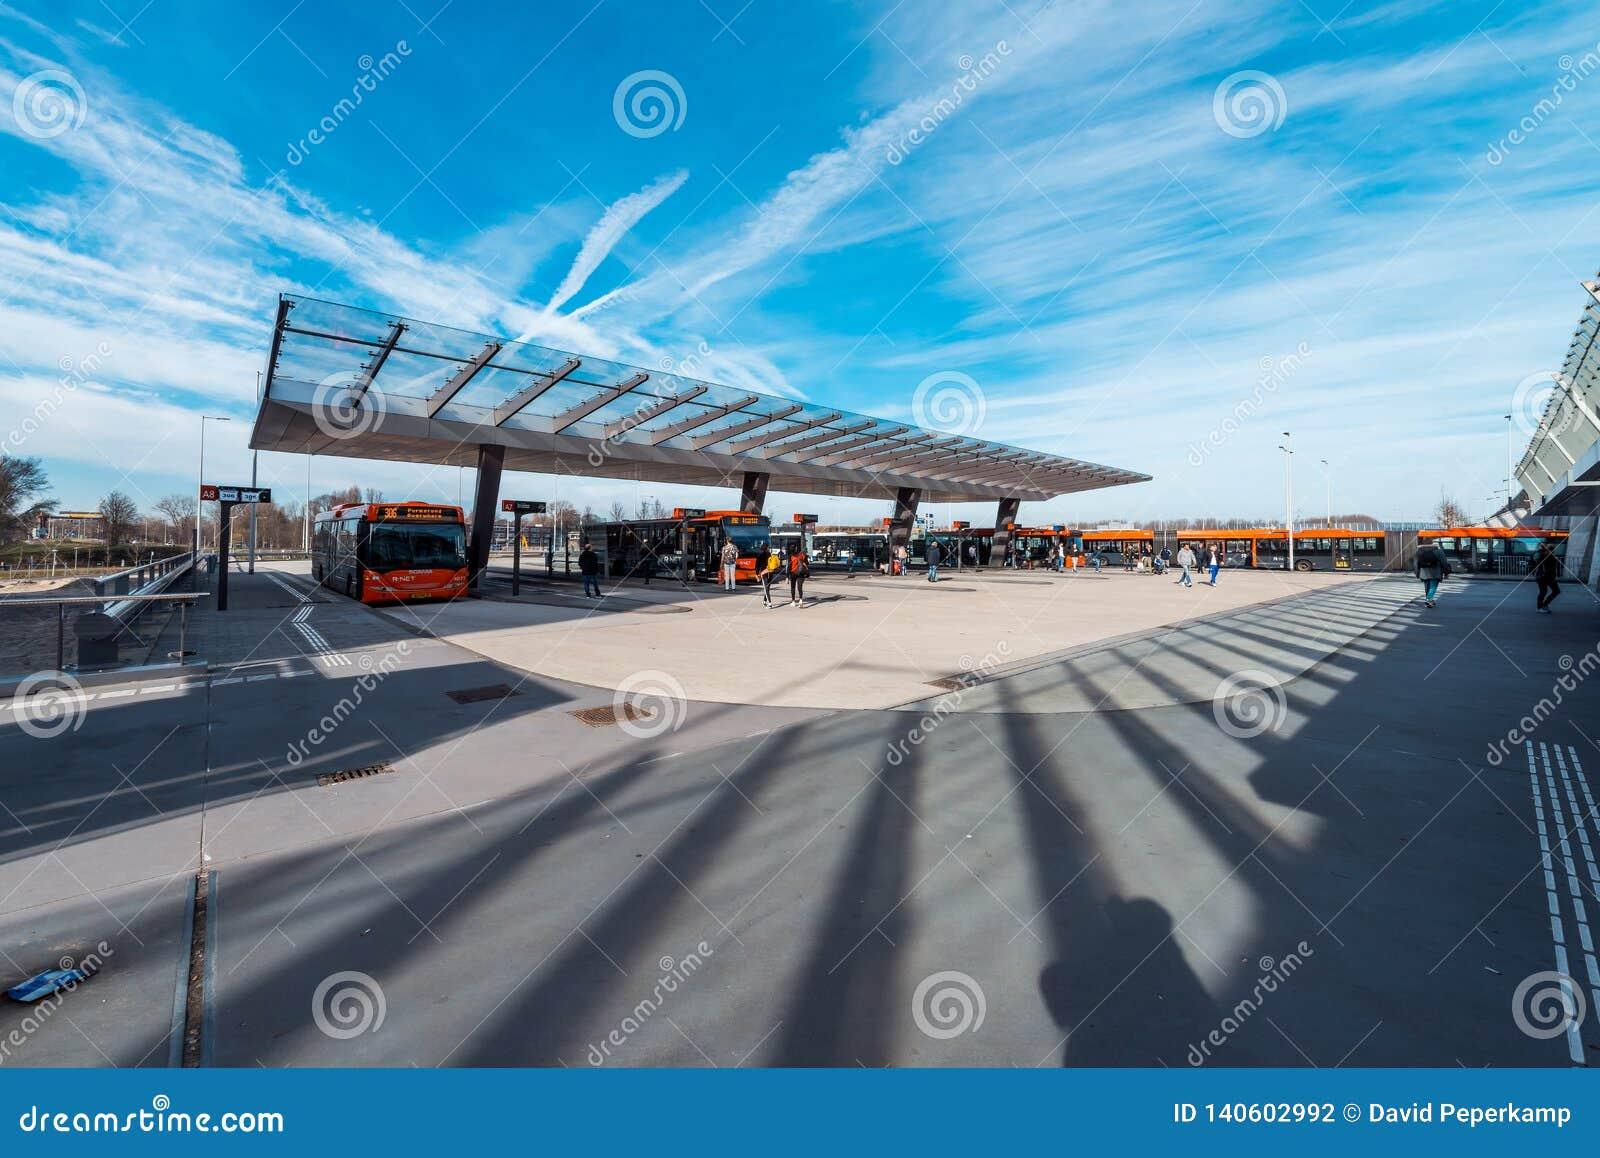 Buss/gångtunnel/tunnelbana/underjordisk station Amsterdam Noord, Nederland